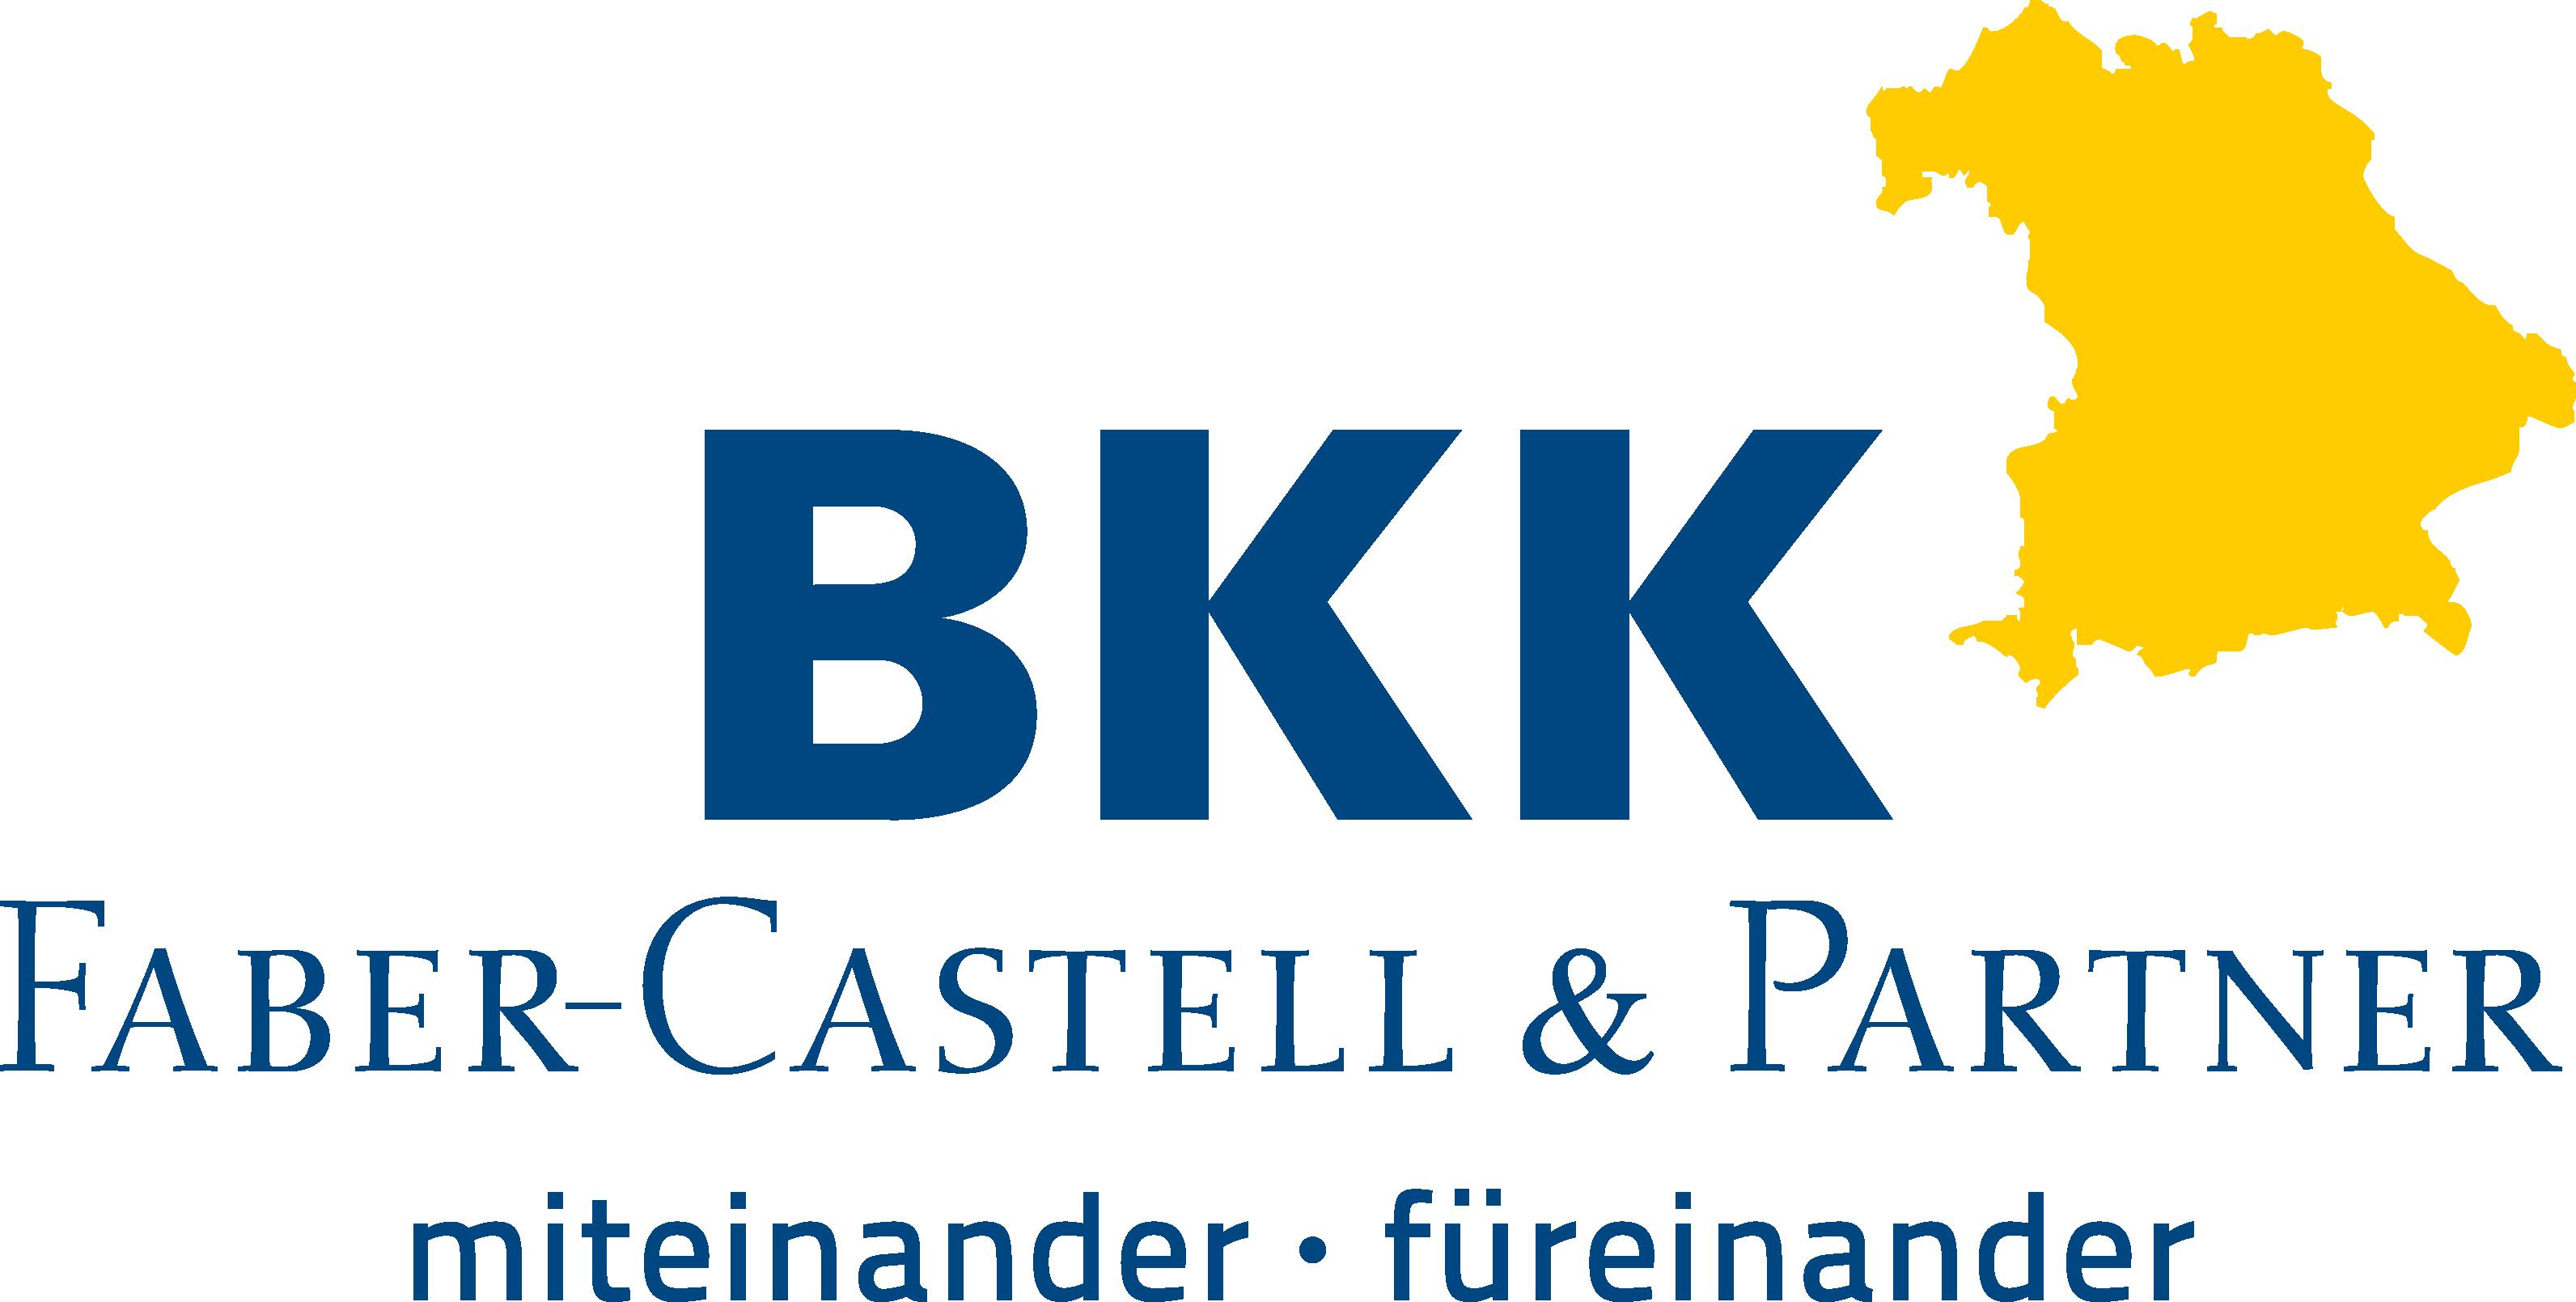 Online-Pflegekurse & Schulungen   BKK Faber-Castell & Partner